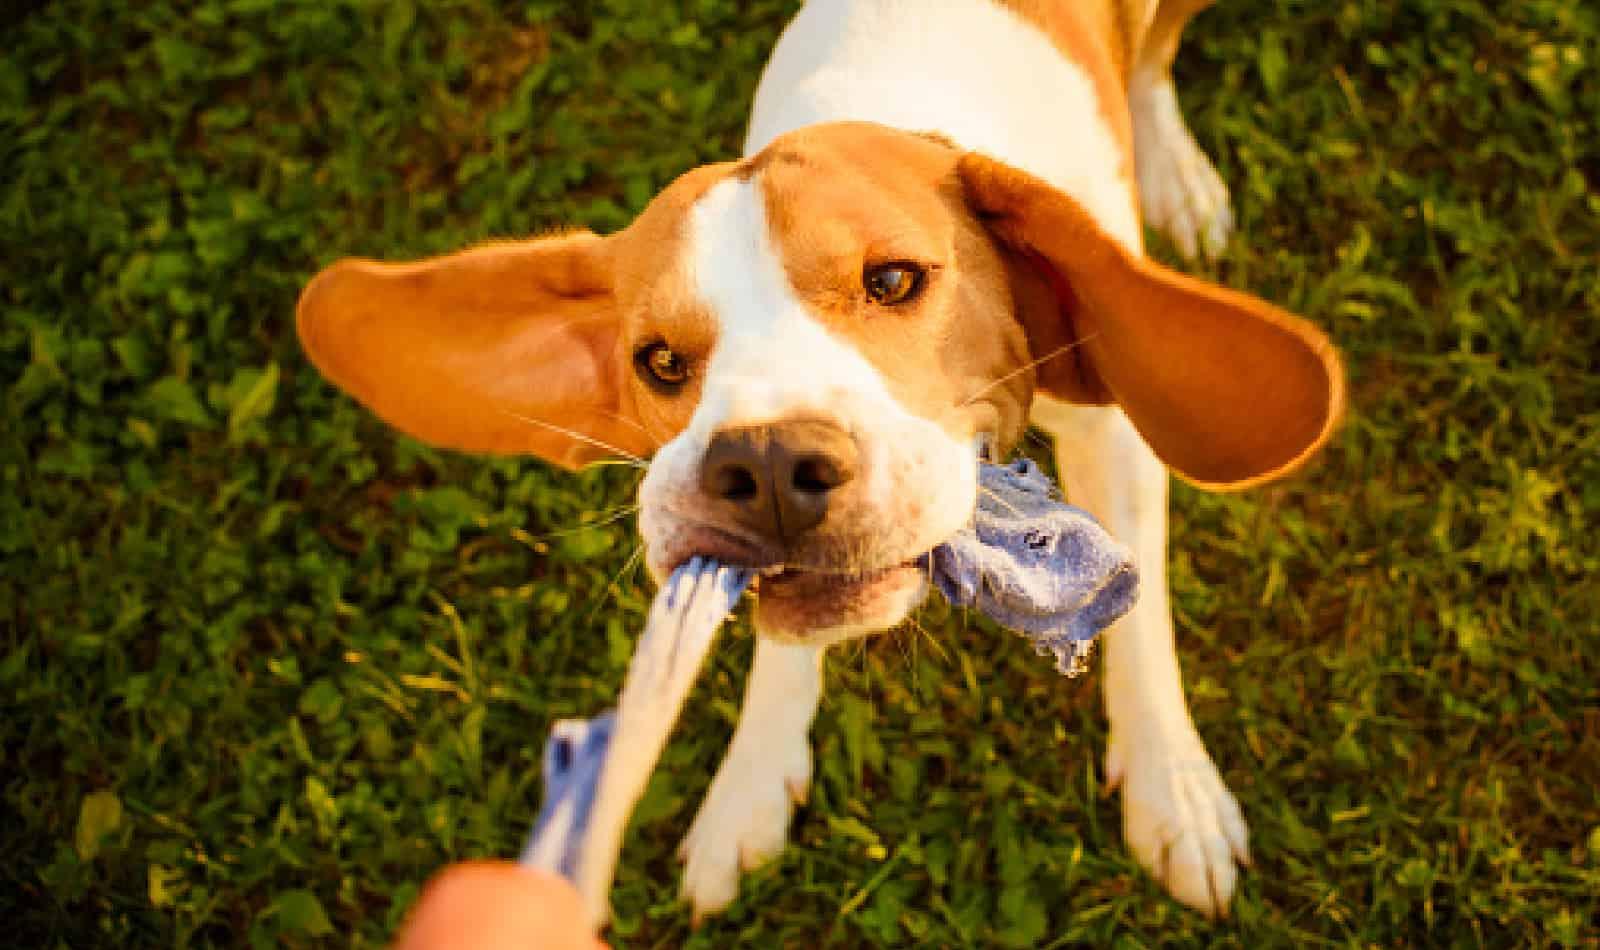 Dog sock tug toy